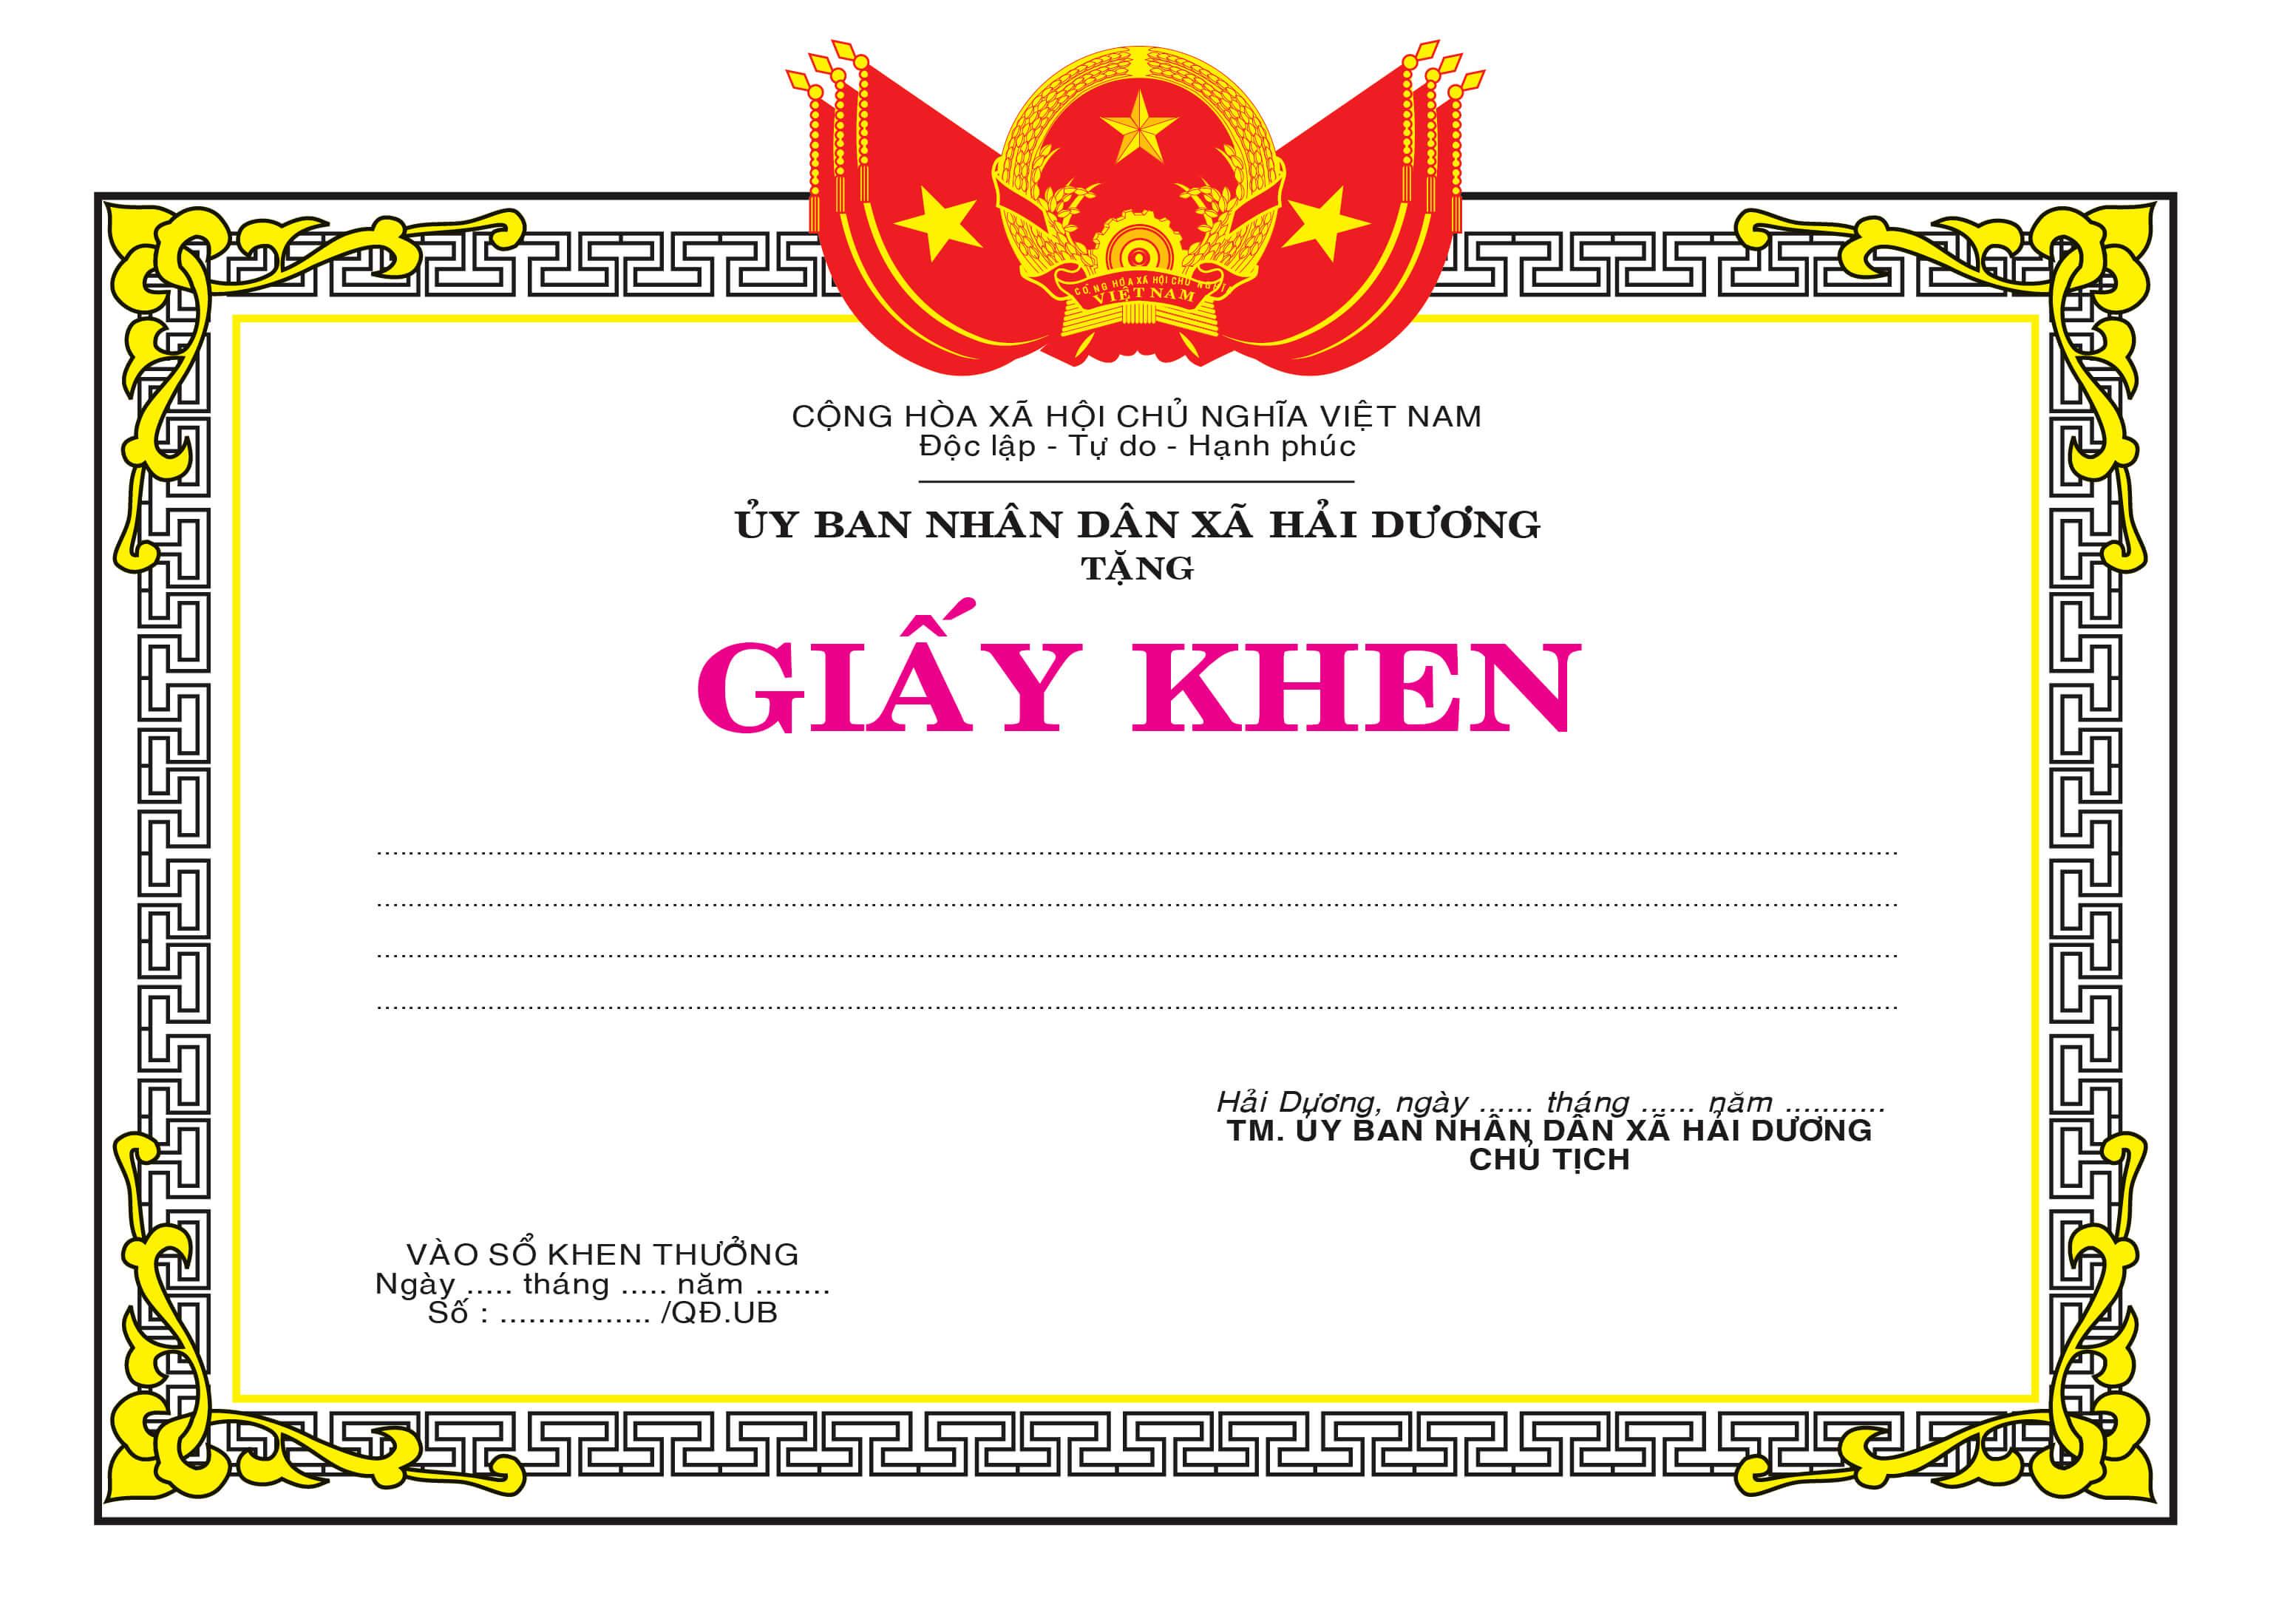 Mẫu giấy khen 060 - Mẫu giấy khen UBND - link download : https://adsnew.net/cP44X2ya